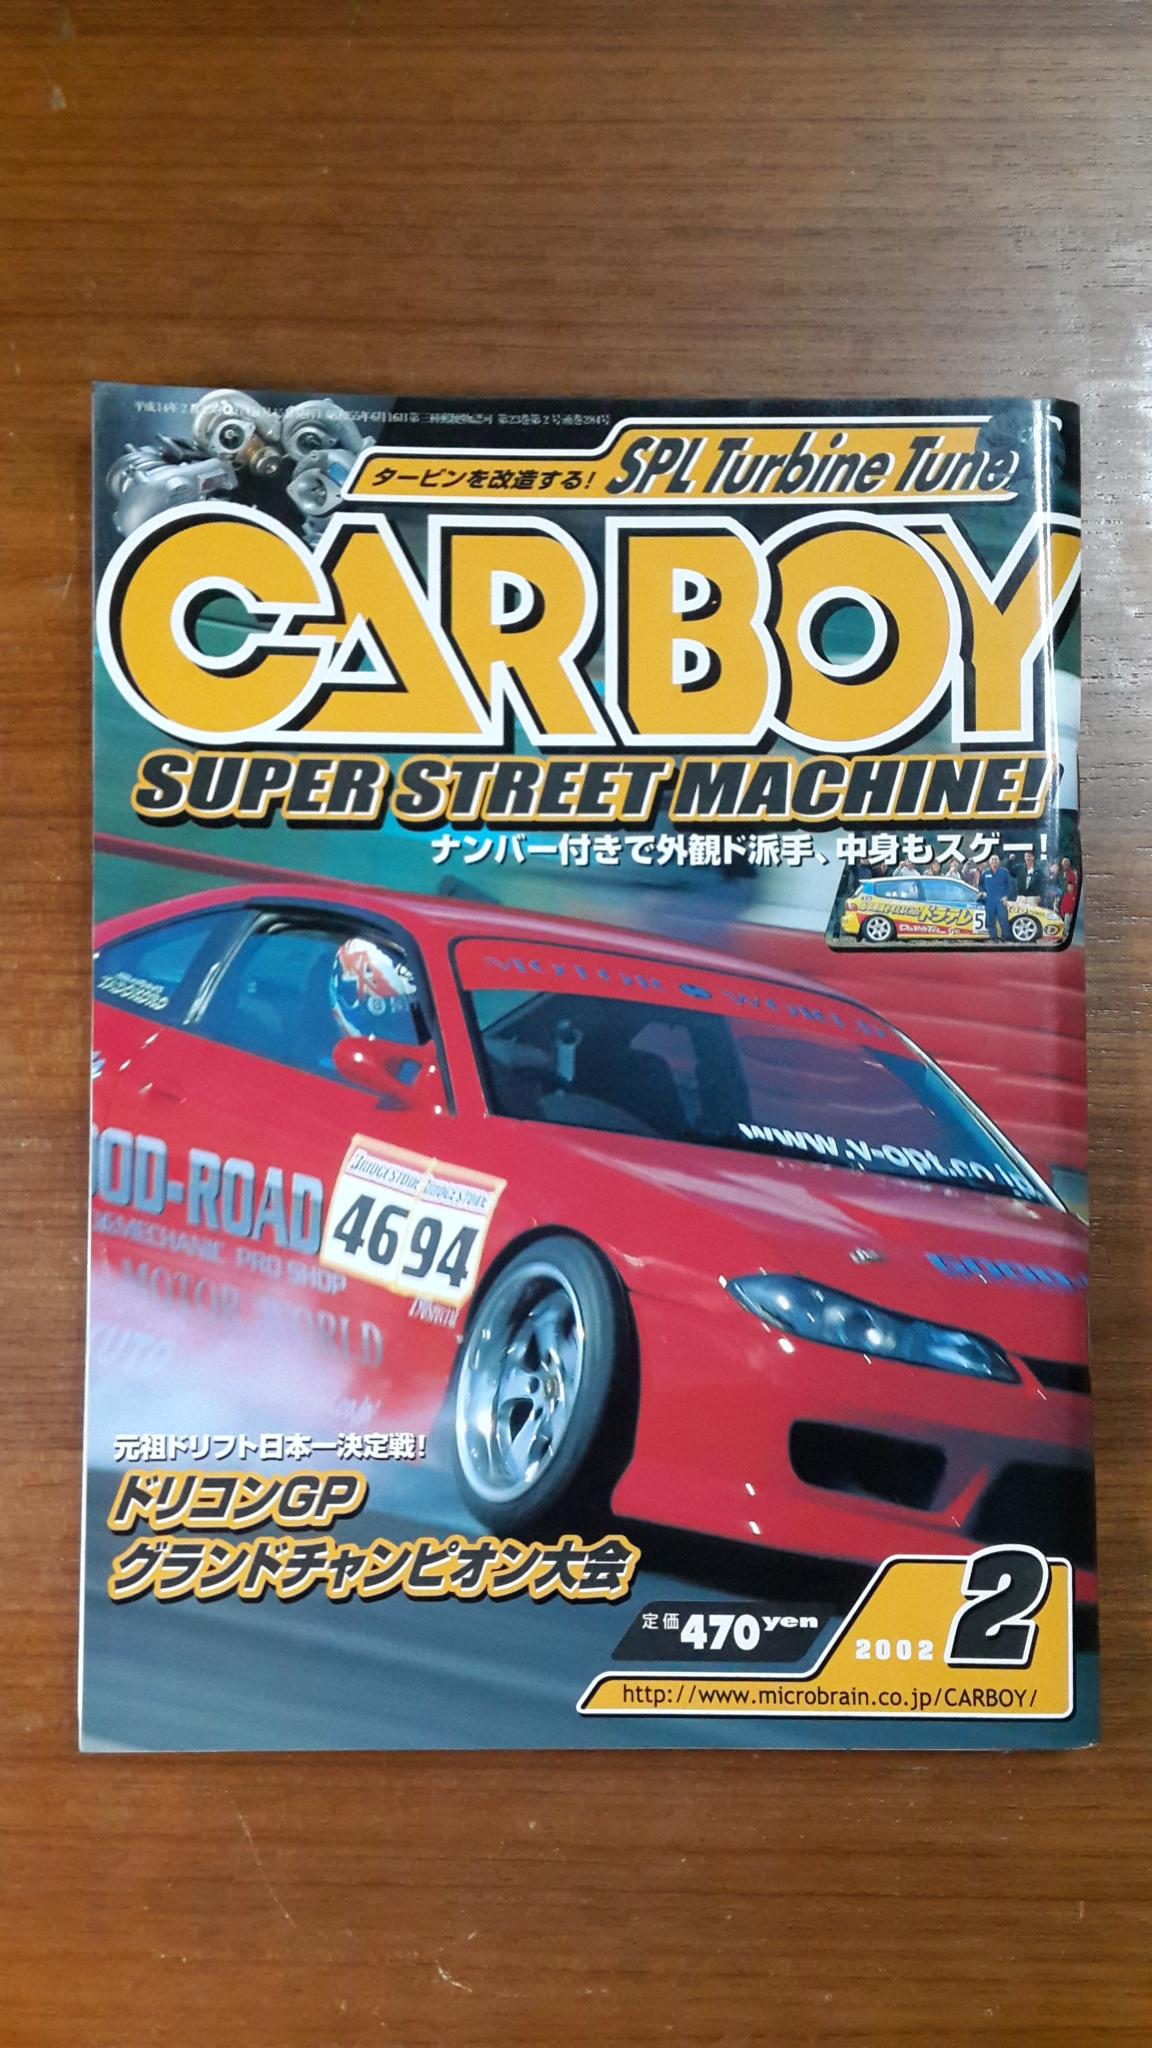 CARBOY (Japan) : 2002 / 2